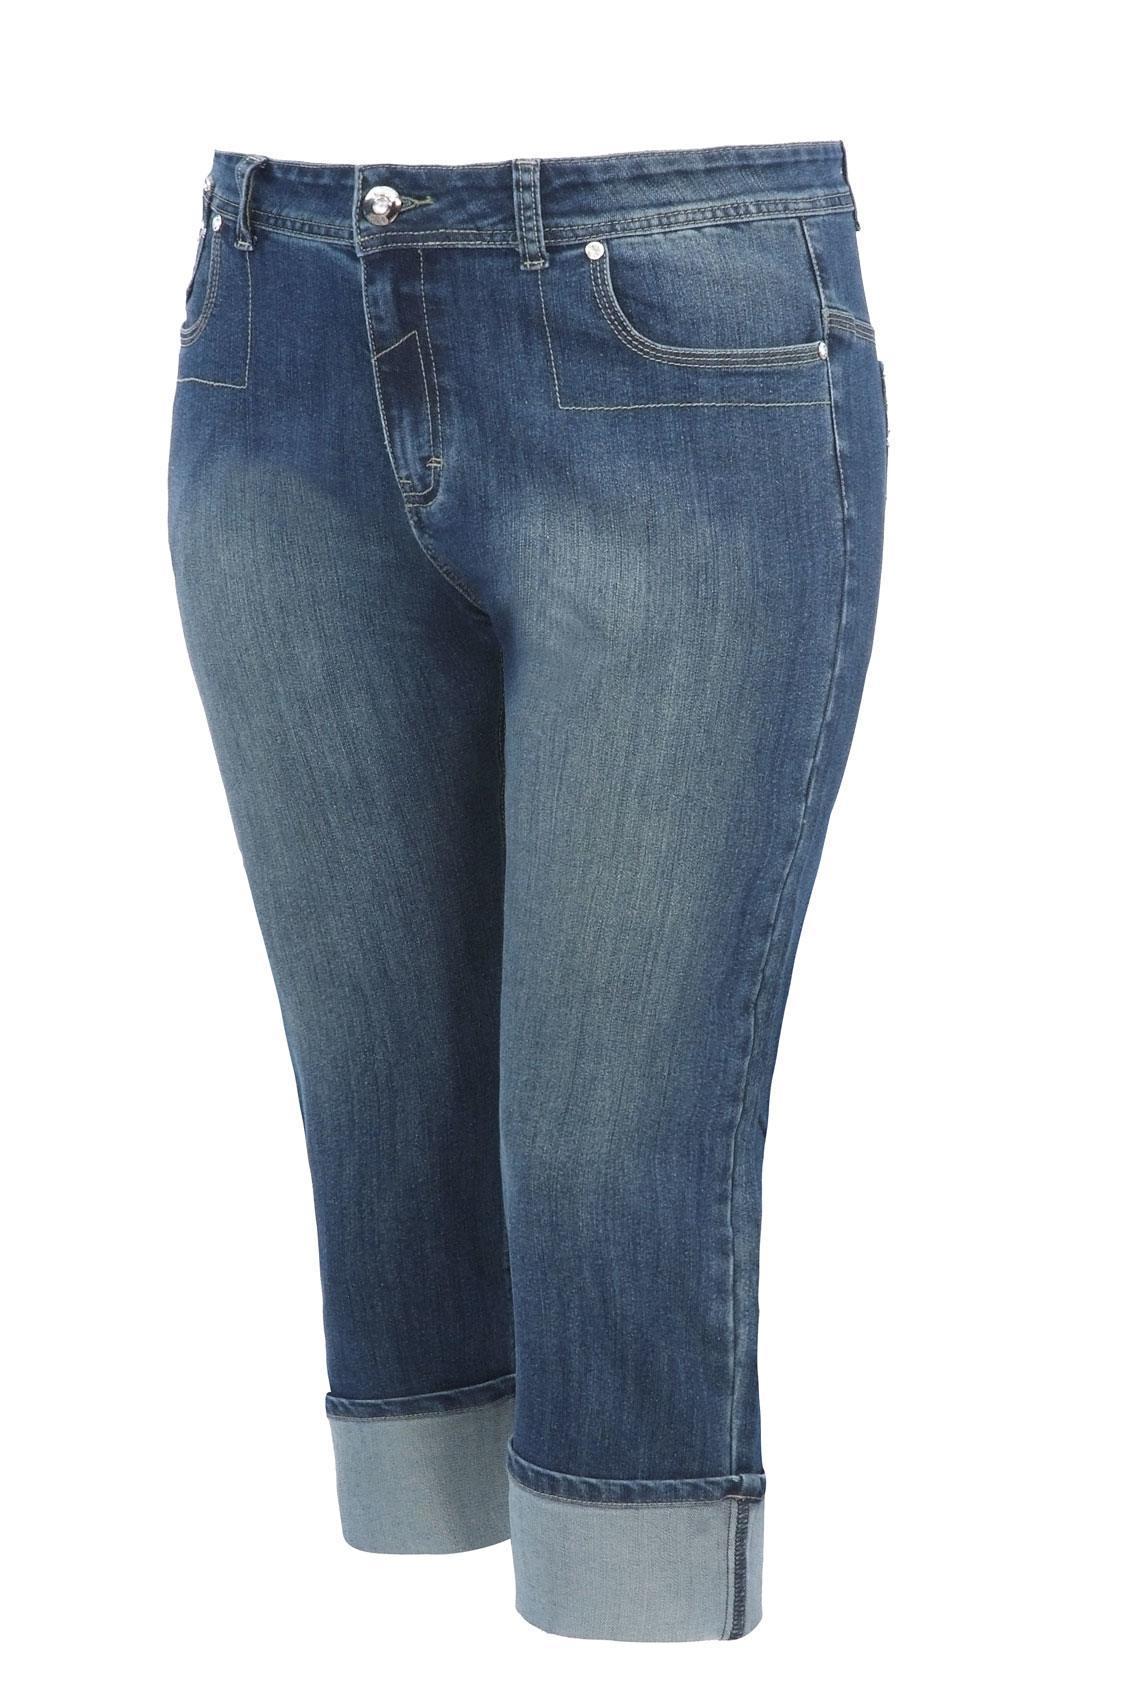 Crop Jeans For Plus Size Women